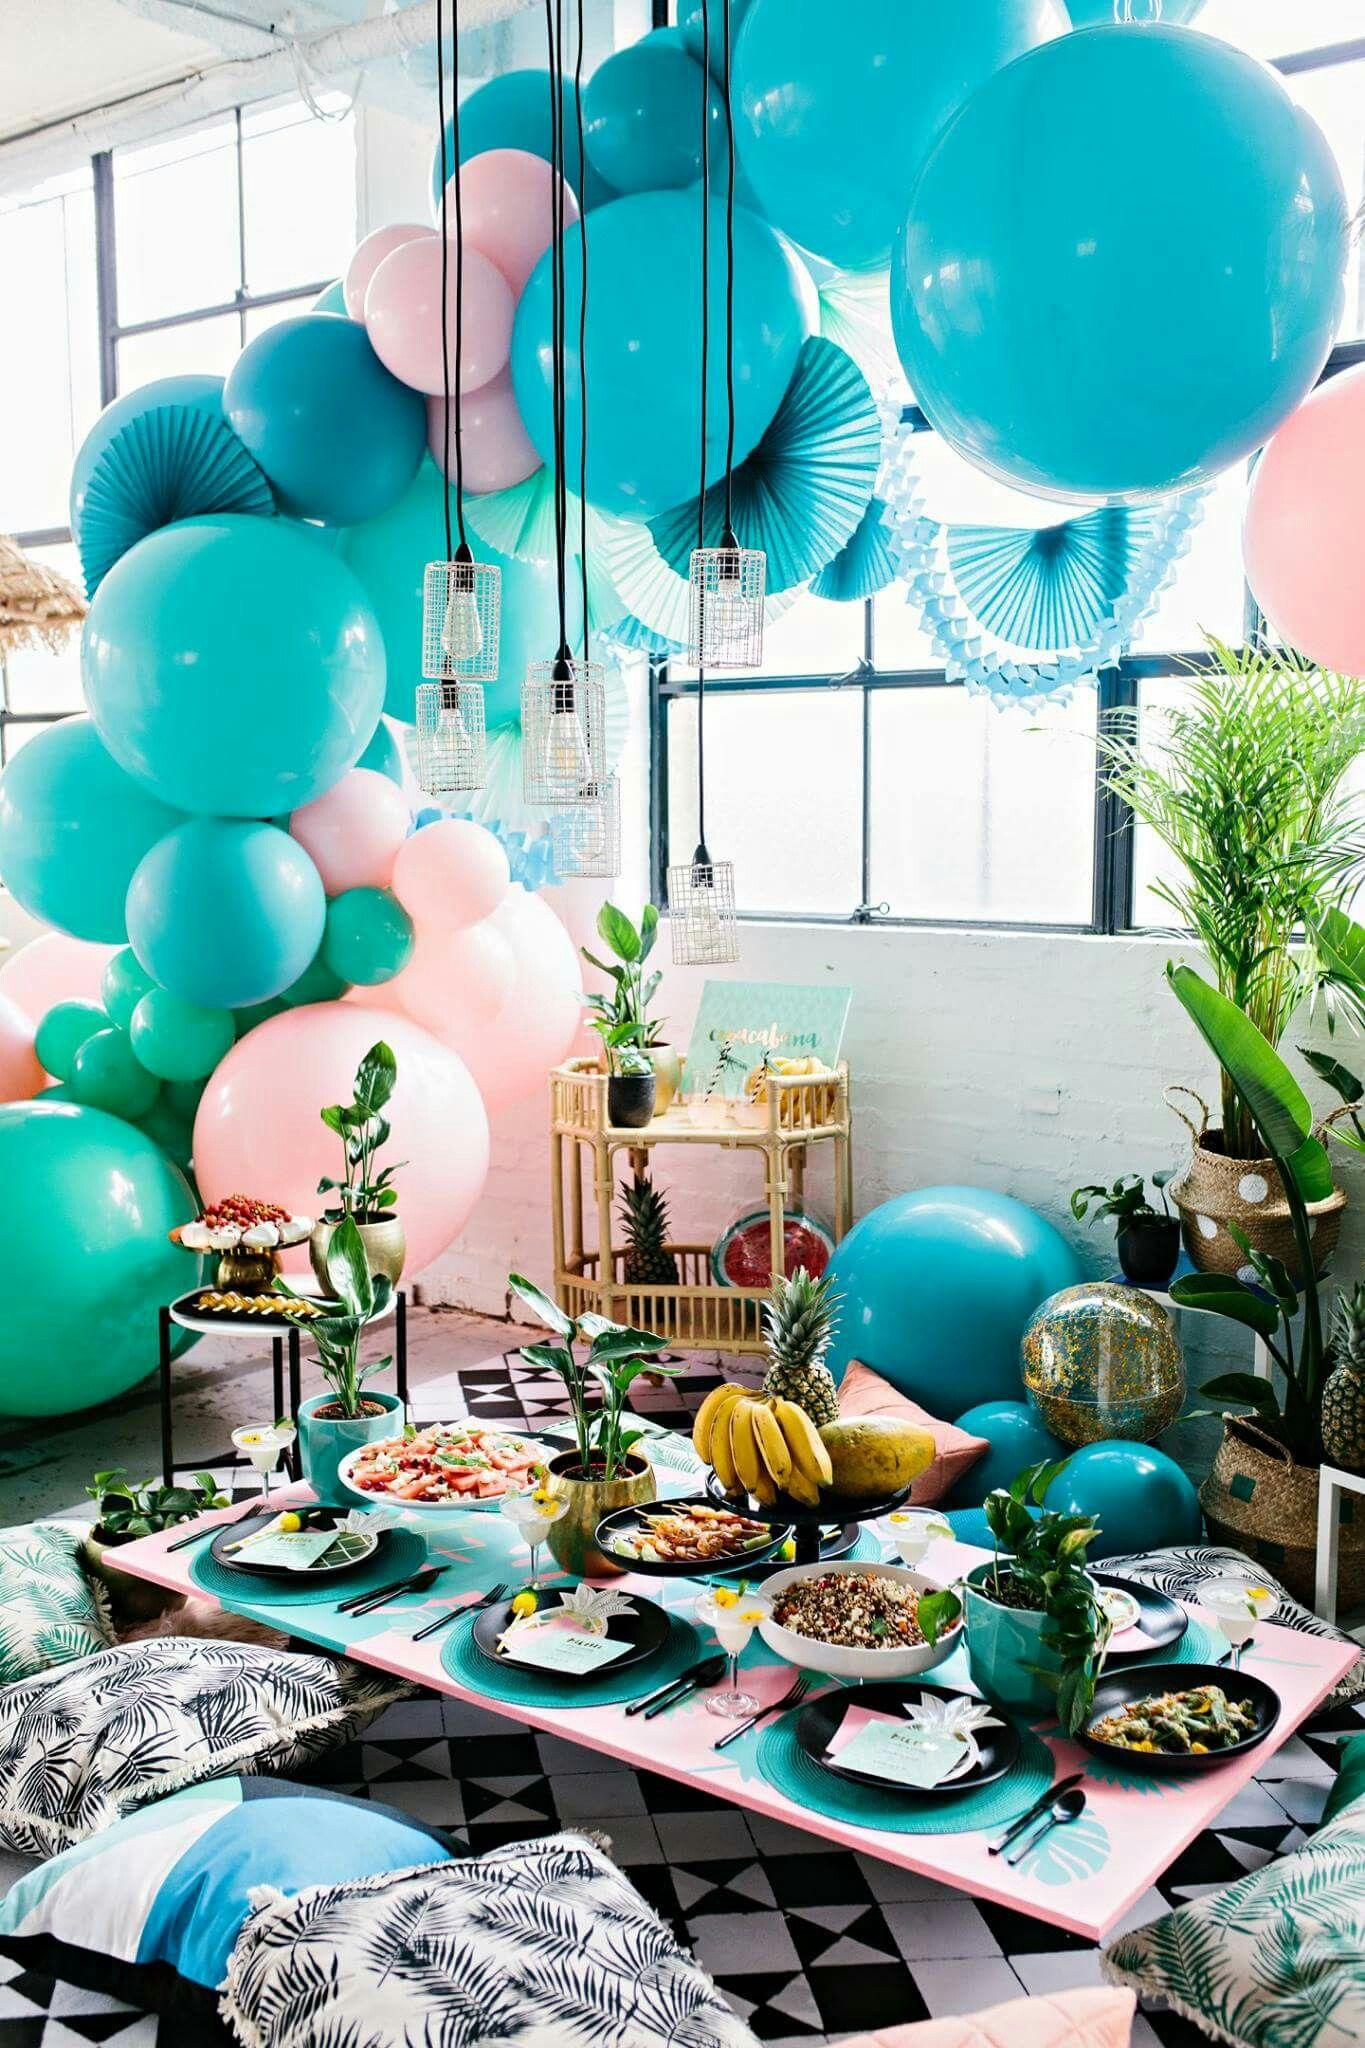 Luftballons Deko, Deko Geburtstag, Fotografie Ideen, Deko Ideen, Kreativ,  Zuhause, Geburtstage, Dekoration, Basteln